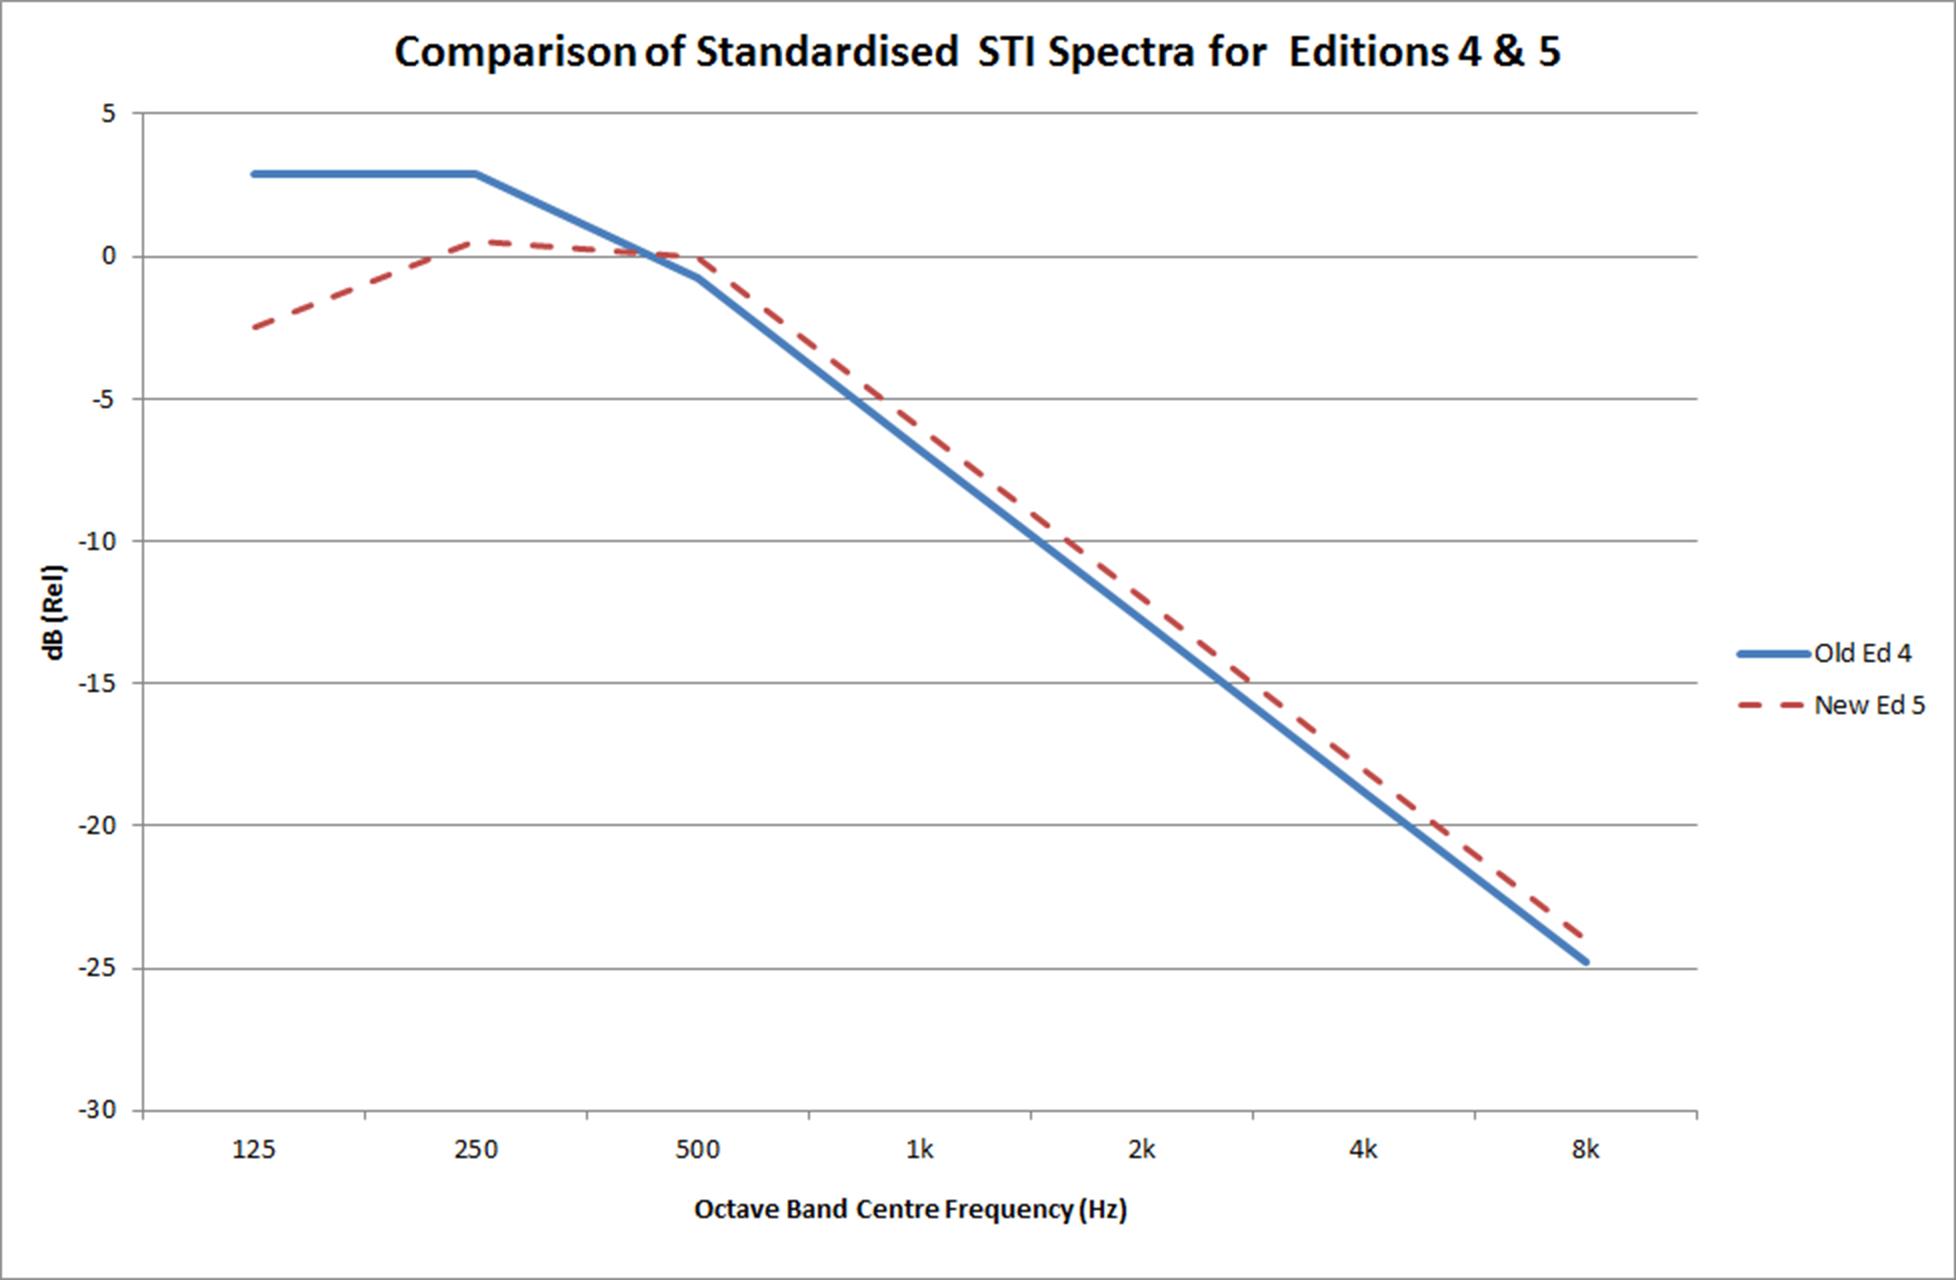 Comparison of Edition 4 and Edition 5 standardized male STI spectra